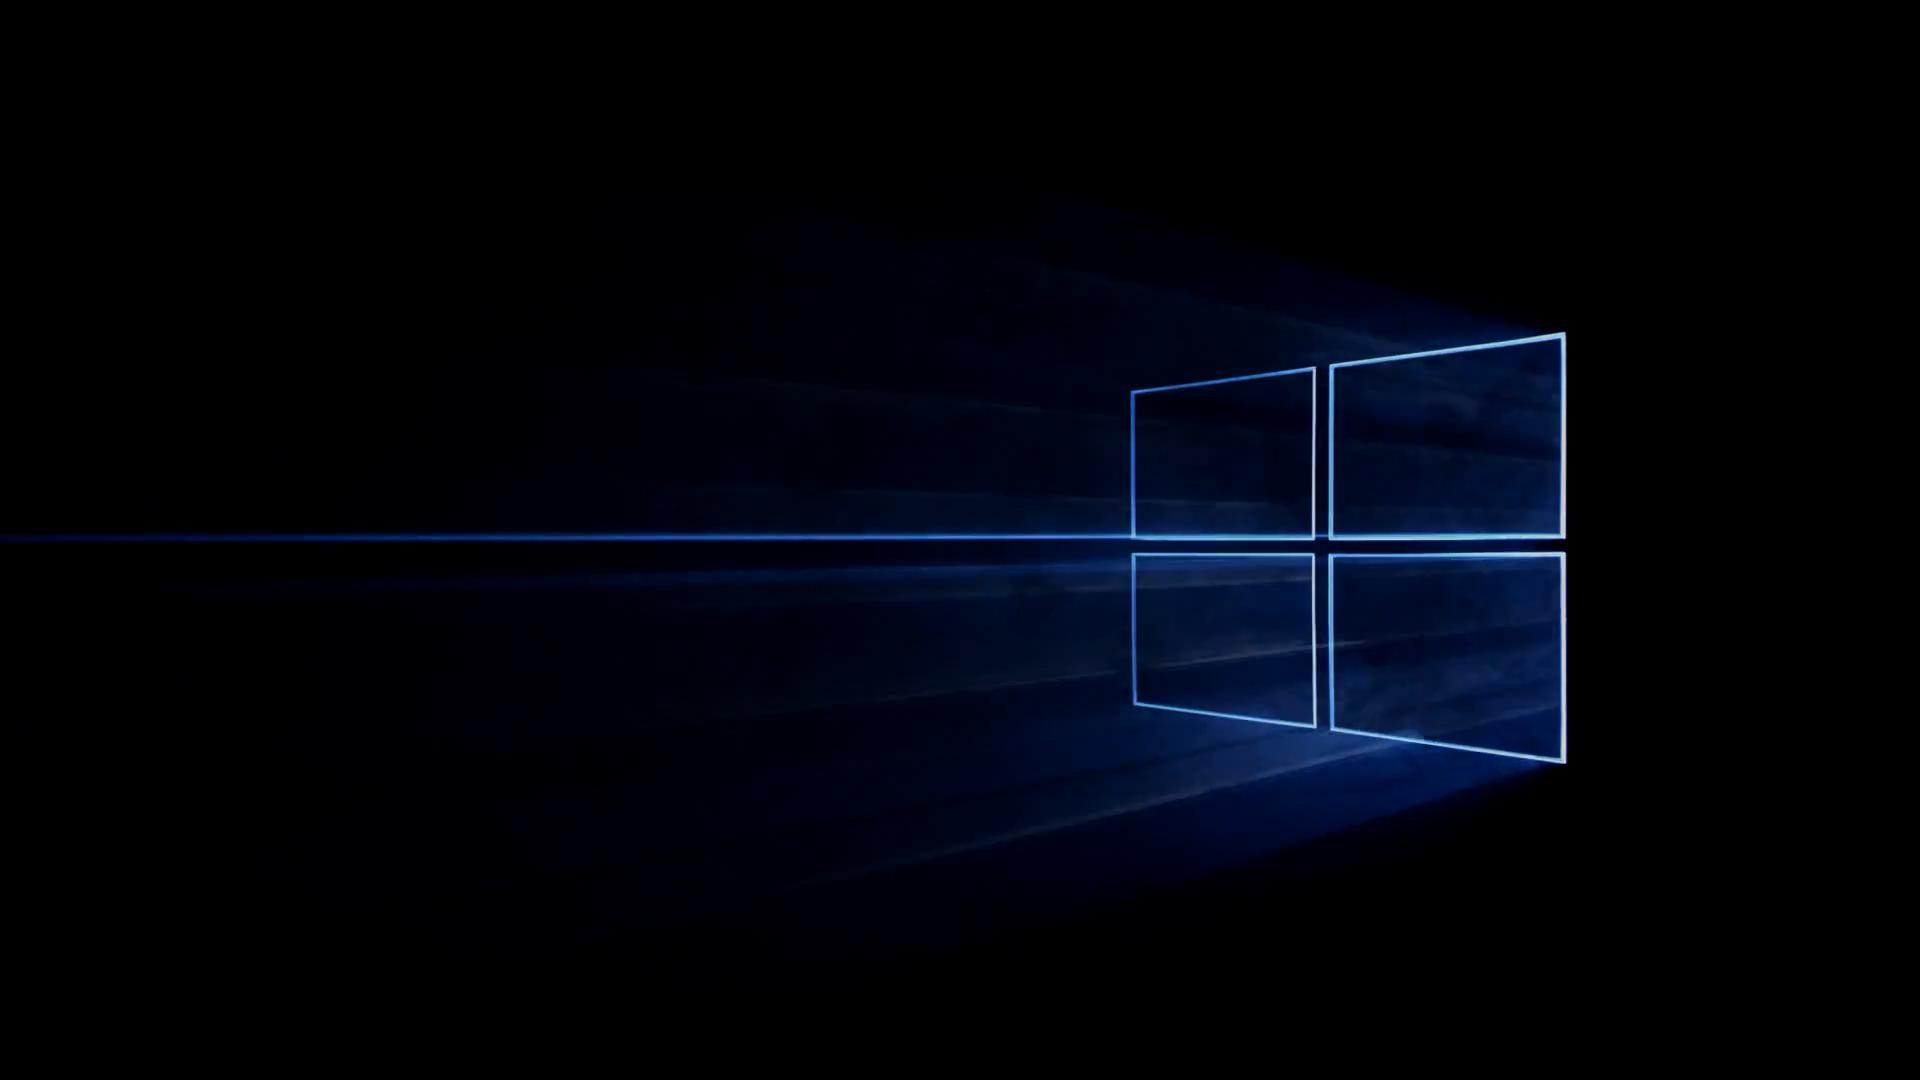 Windows 10 Dark Blue Wallpapers Hd Wallpapers